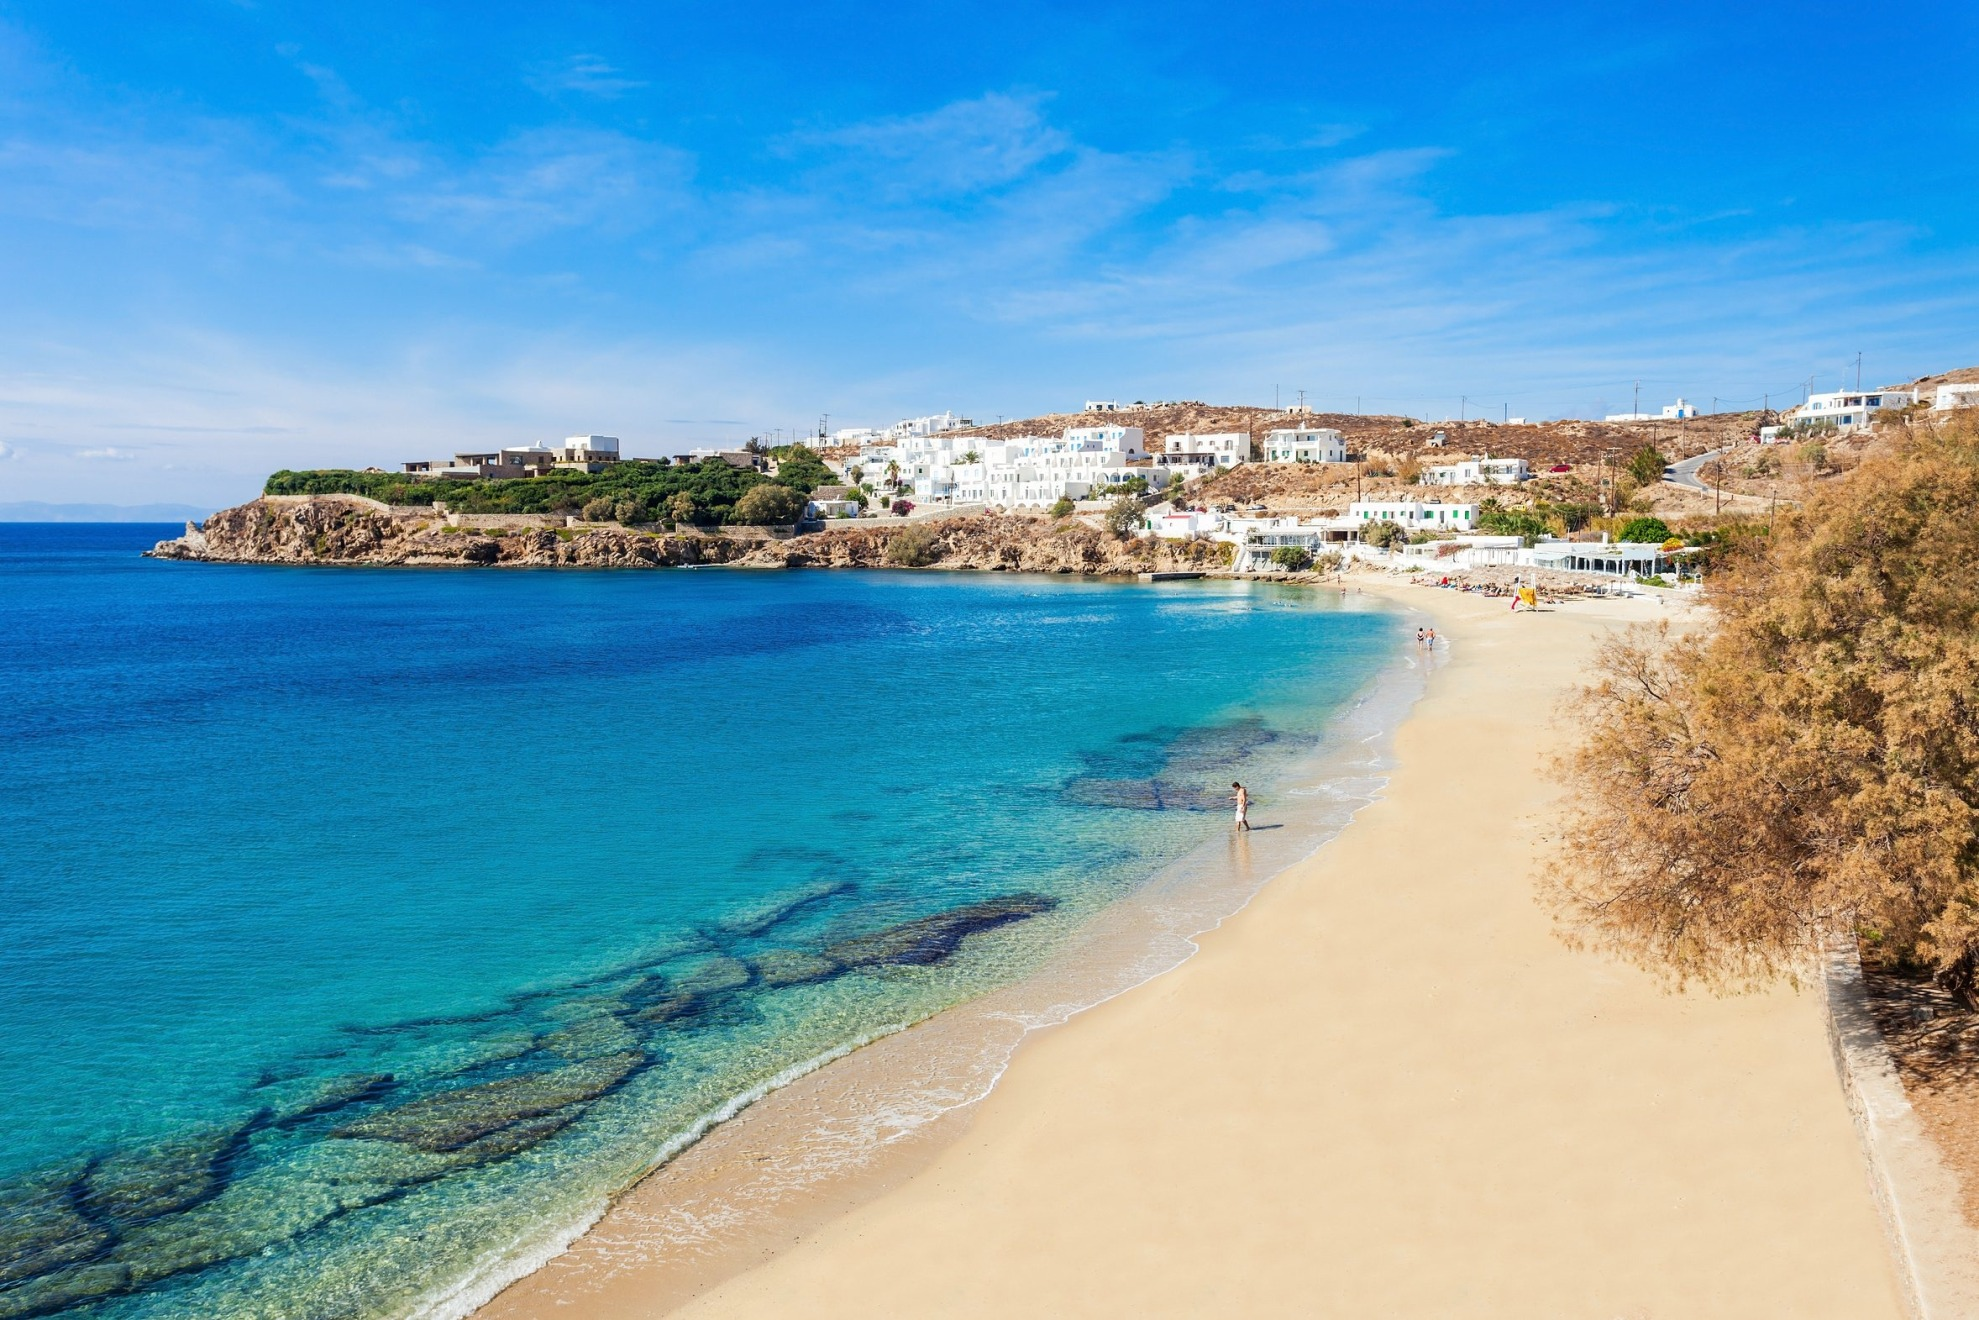 Agios Stefanos beach Mykonos island, Greece - Mykonos Traveller